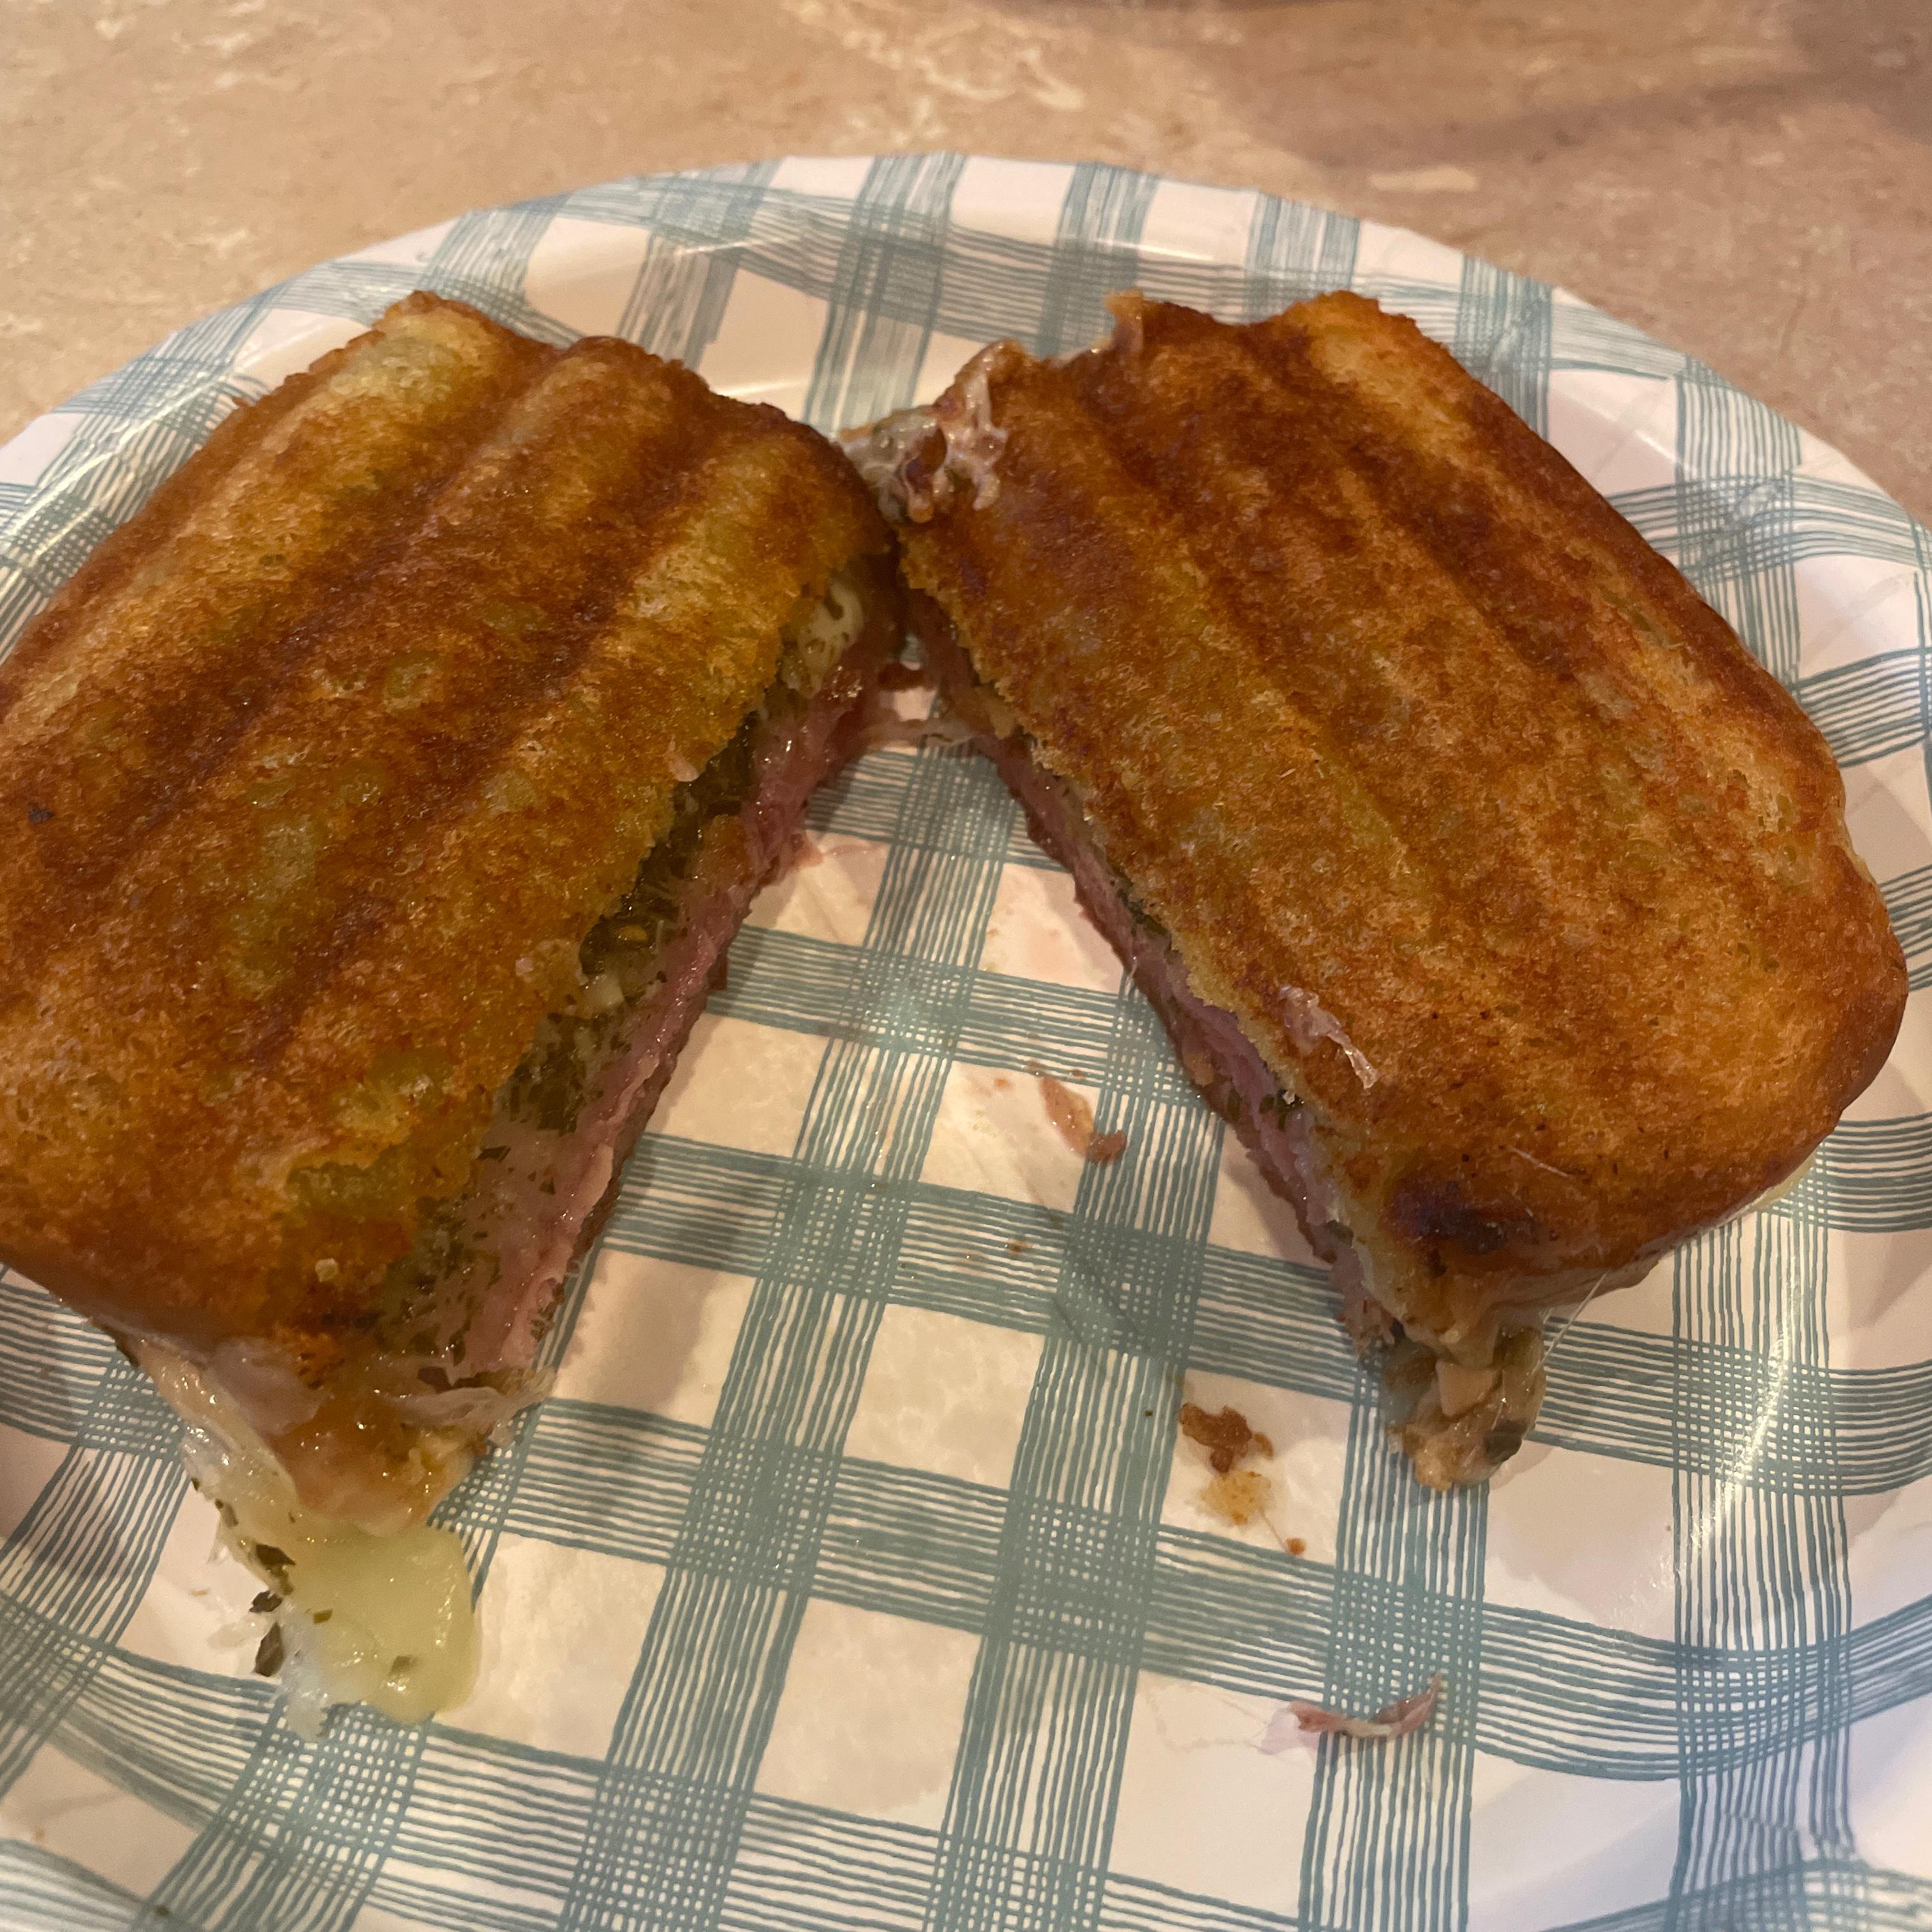 Prosciutto and Provolone Panini Sandwiches Jackie